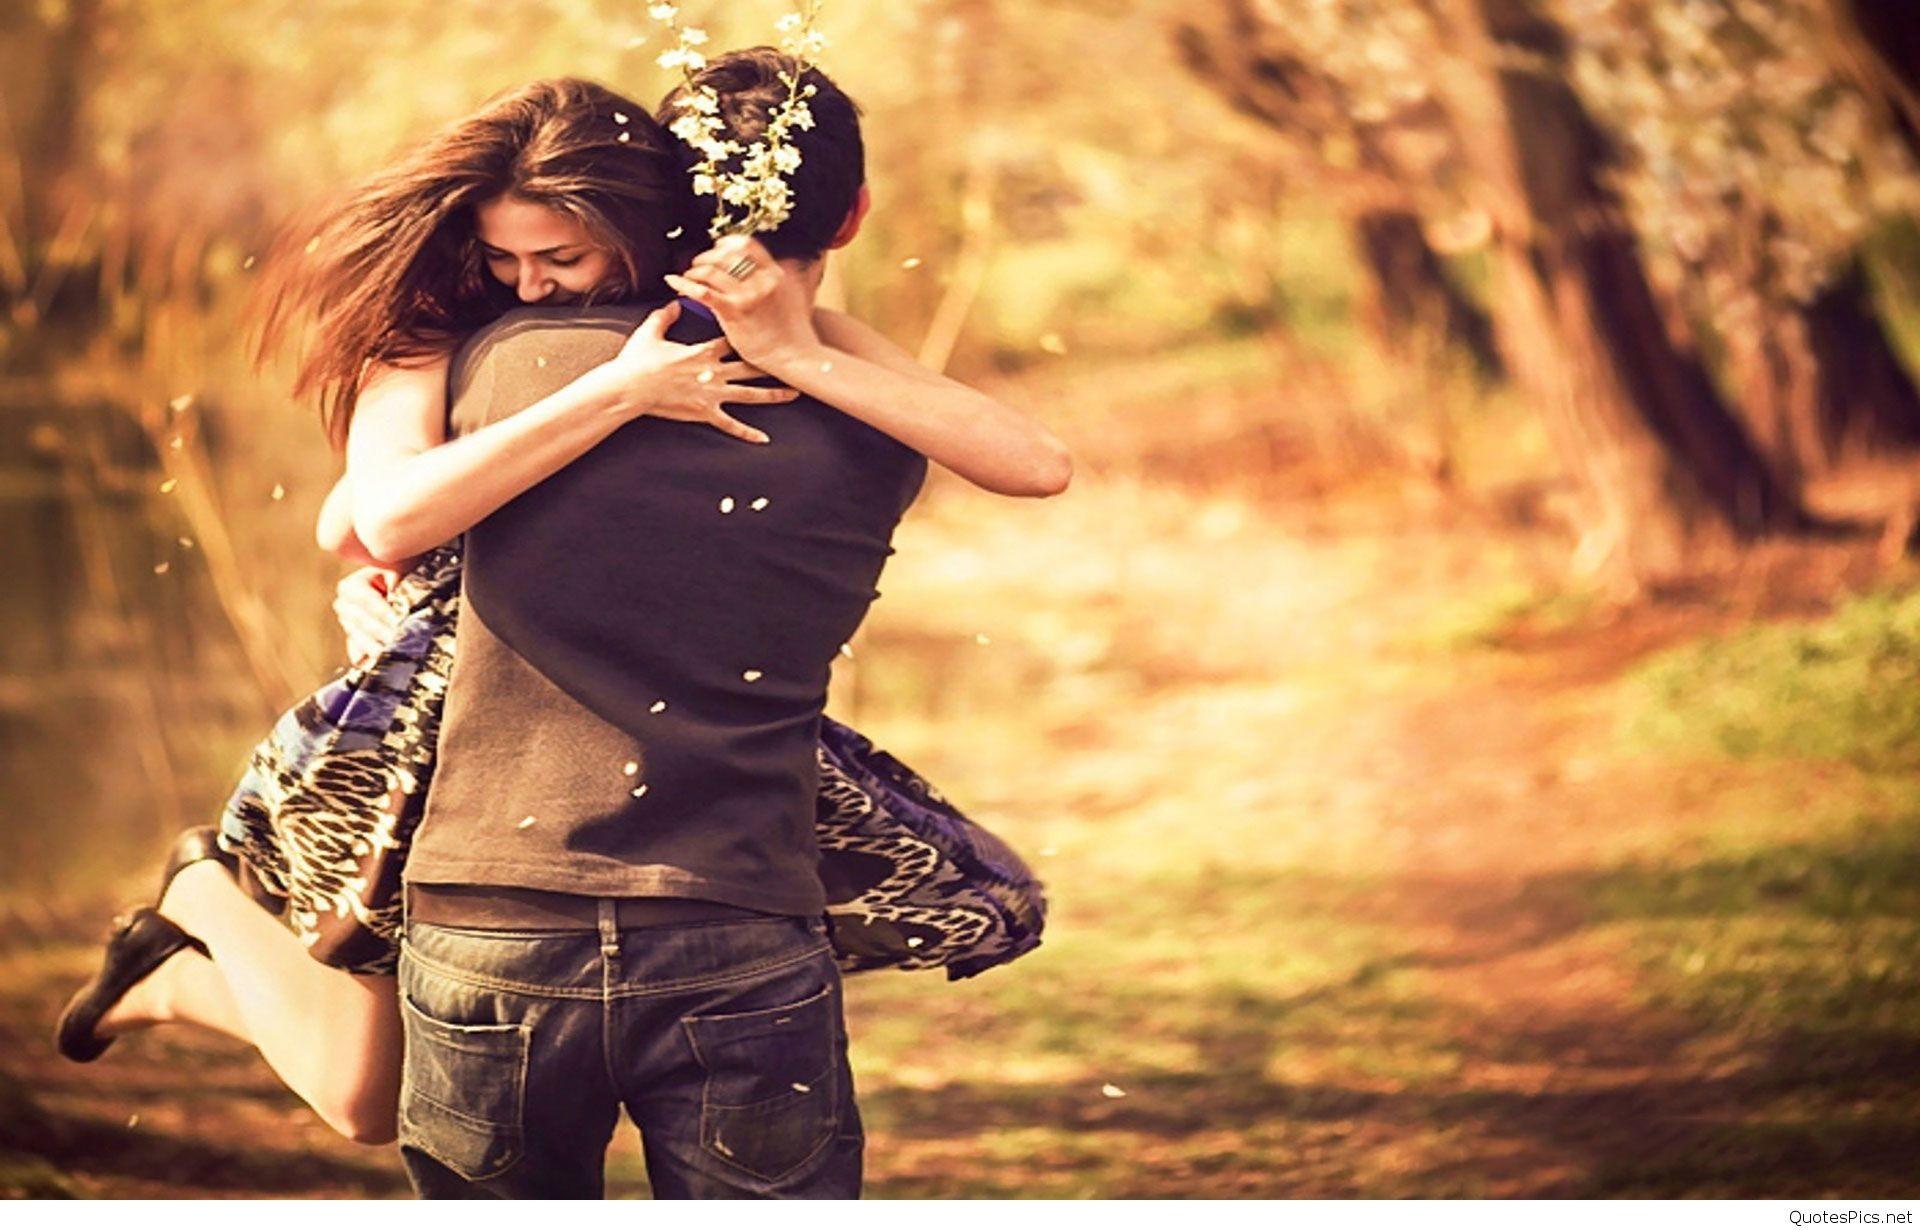 Love Hug Wallpapers 67 Pictures